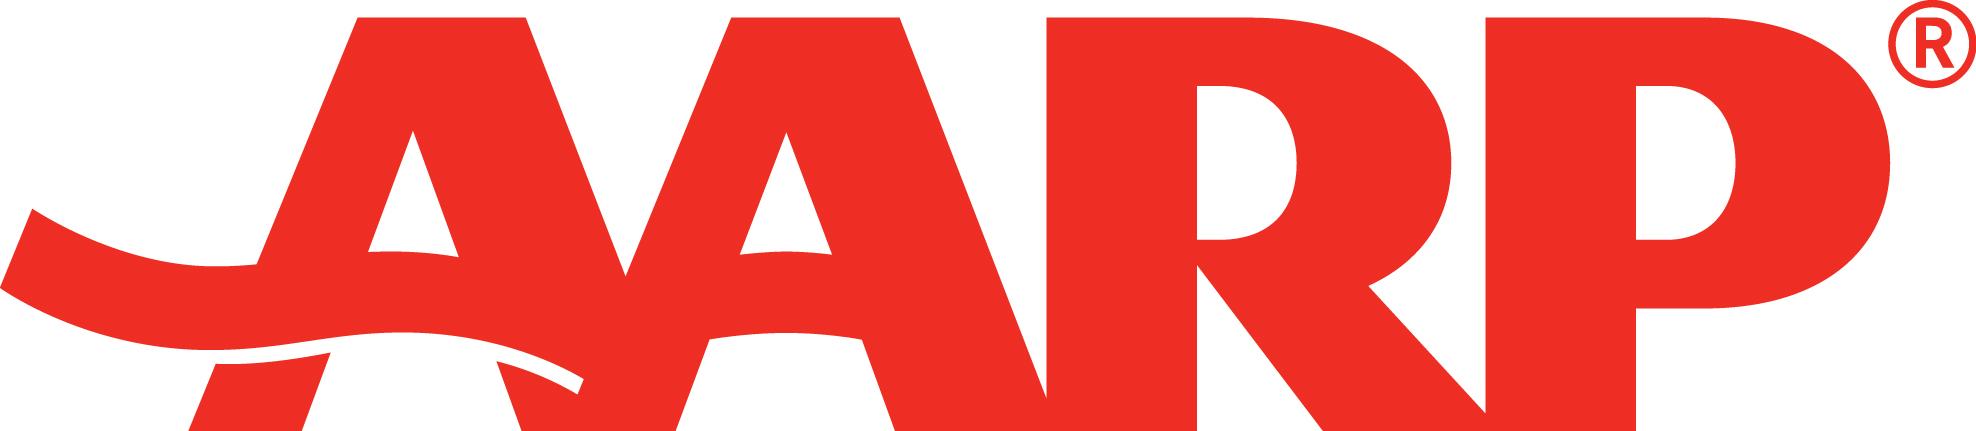 Military Save 20% Off AARP Membership